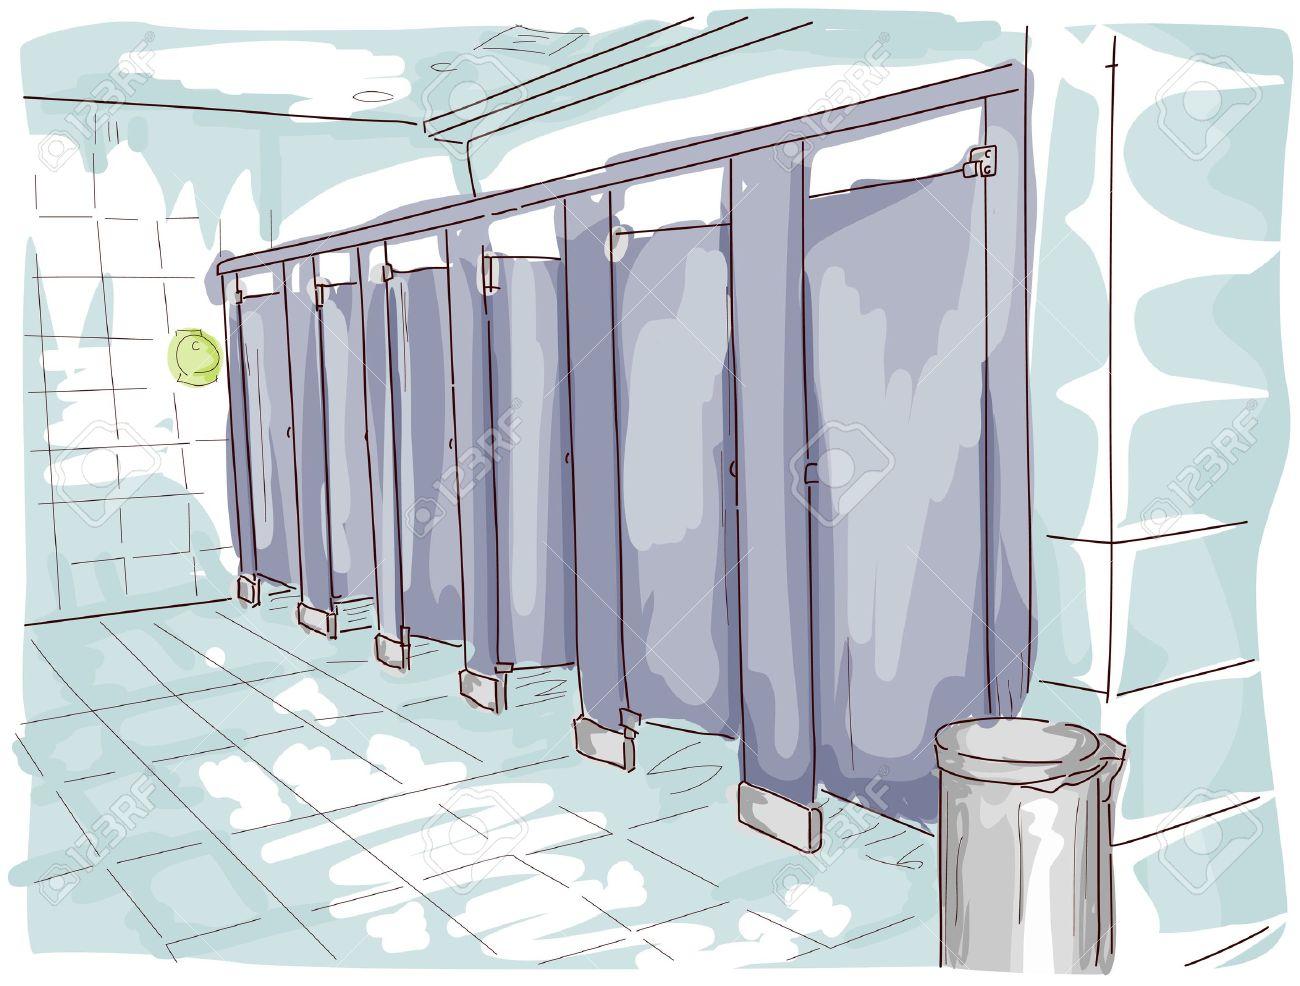 Elementary School Bathroom Design brilliant elementary school bathrooms clipart in ideas